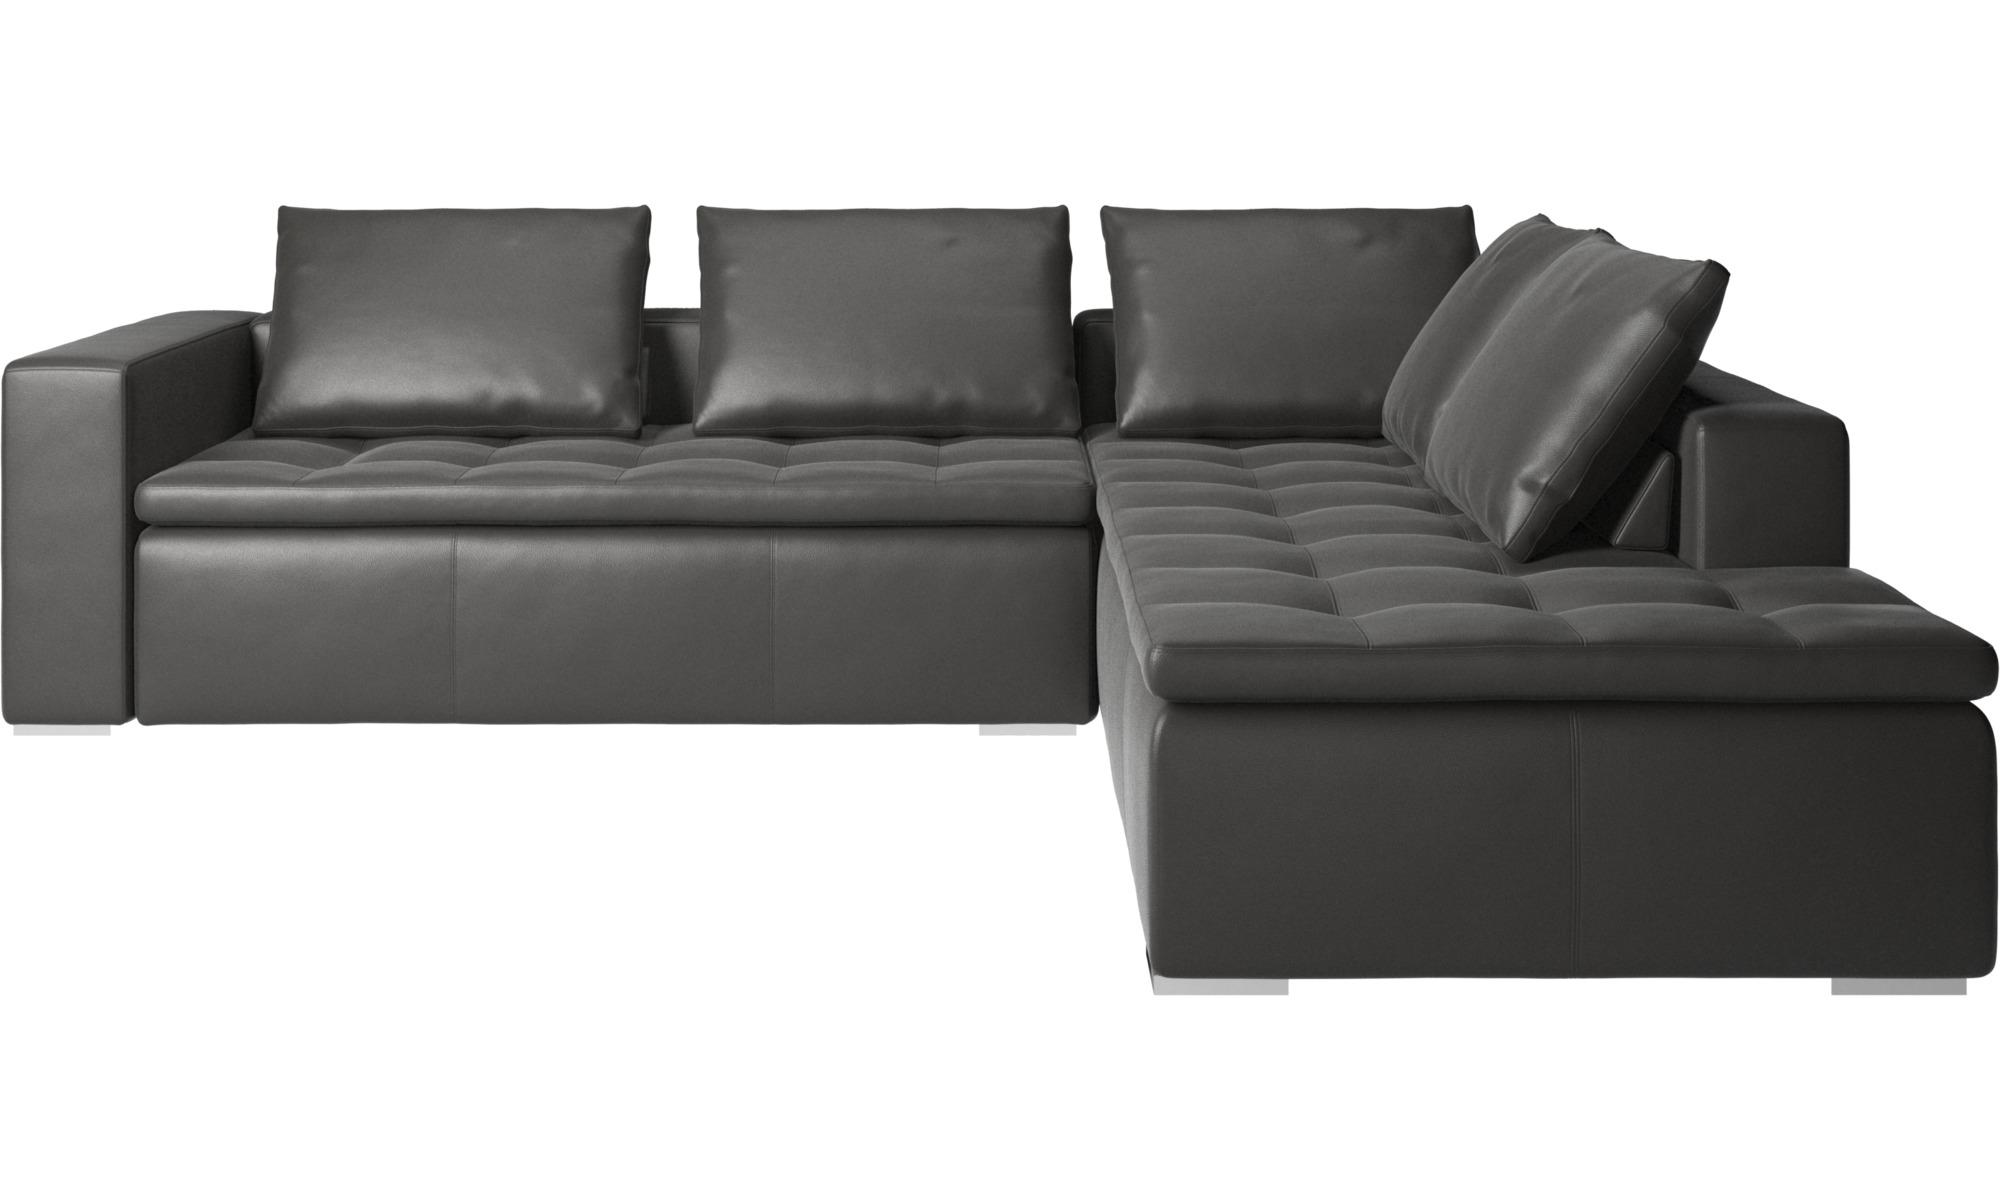 corner sofas mezzo corner sofa with lounging unit boconcept. Black Bedroom Furniture Sets. Home Design Ideas